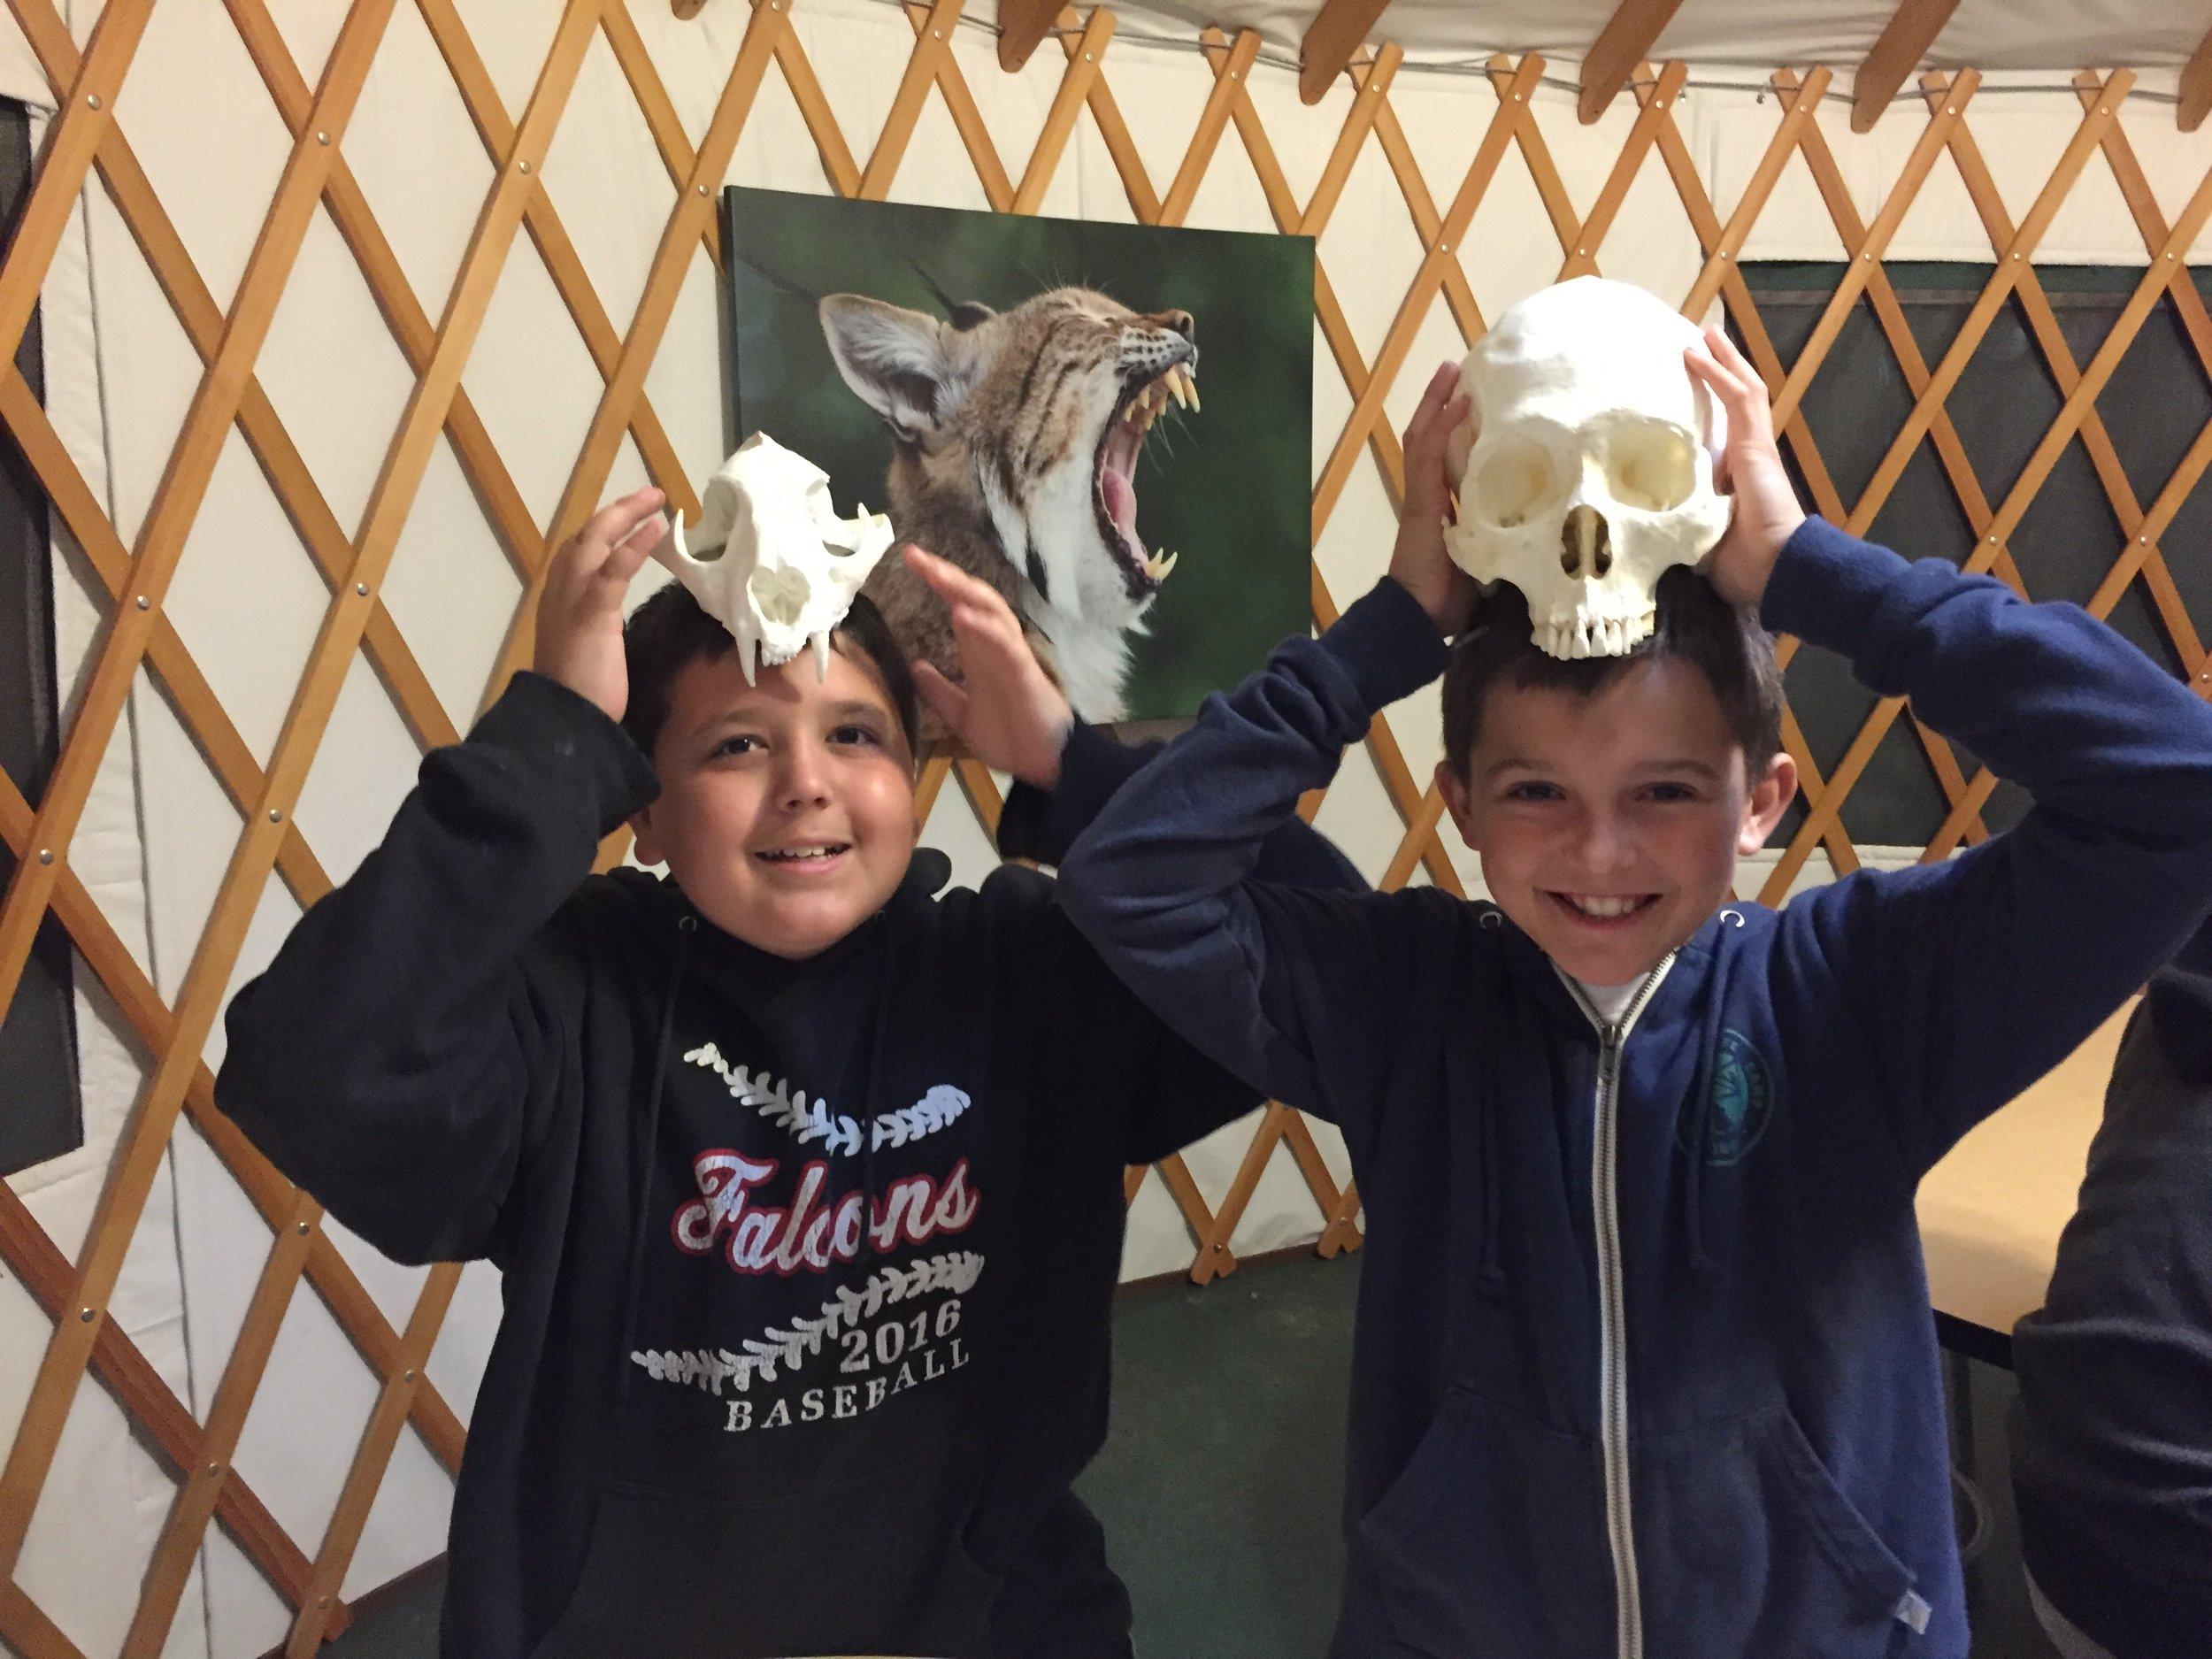 WW Skulls - 2 Students Comparing